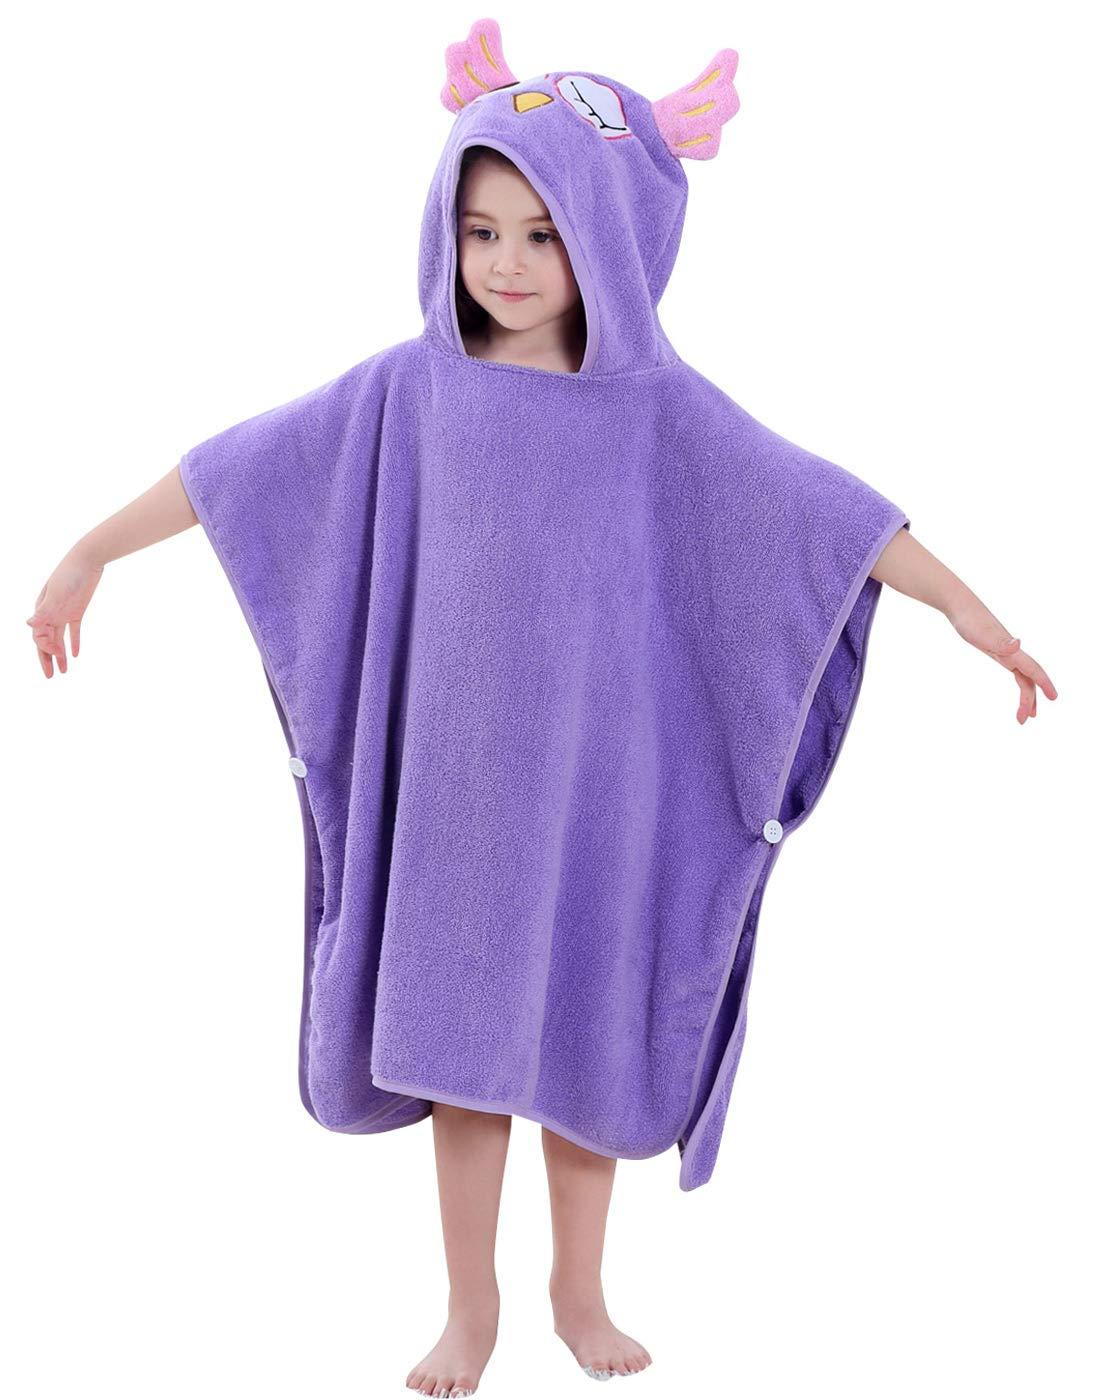 "Baby Boys Cotton Bath Towel Soft Hooded Beach Towel Bathrobe Wrap Absorbent Washcloth for Kids Shower 27.5""x27.5"" Purple"